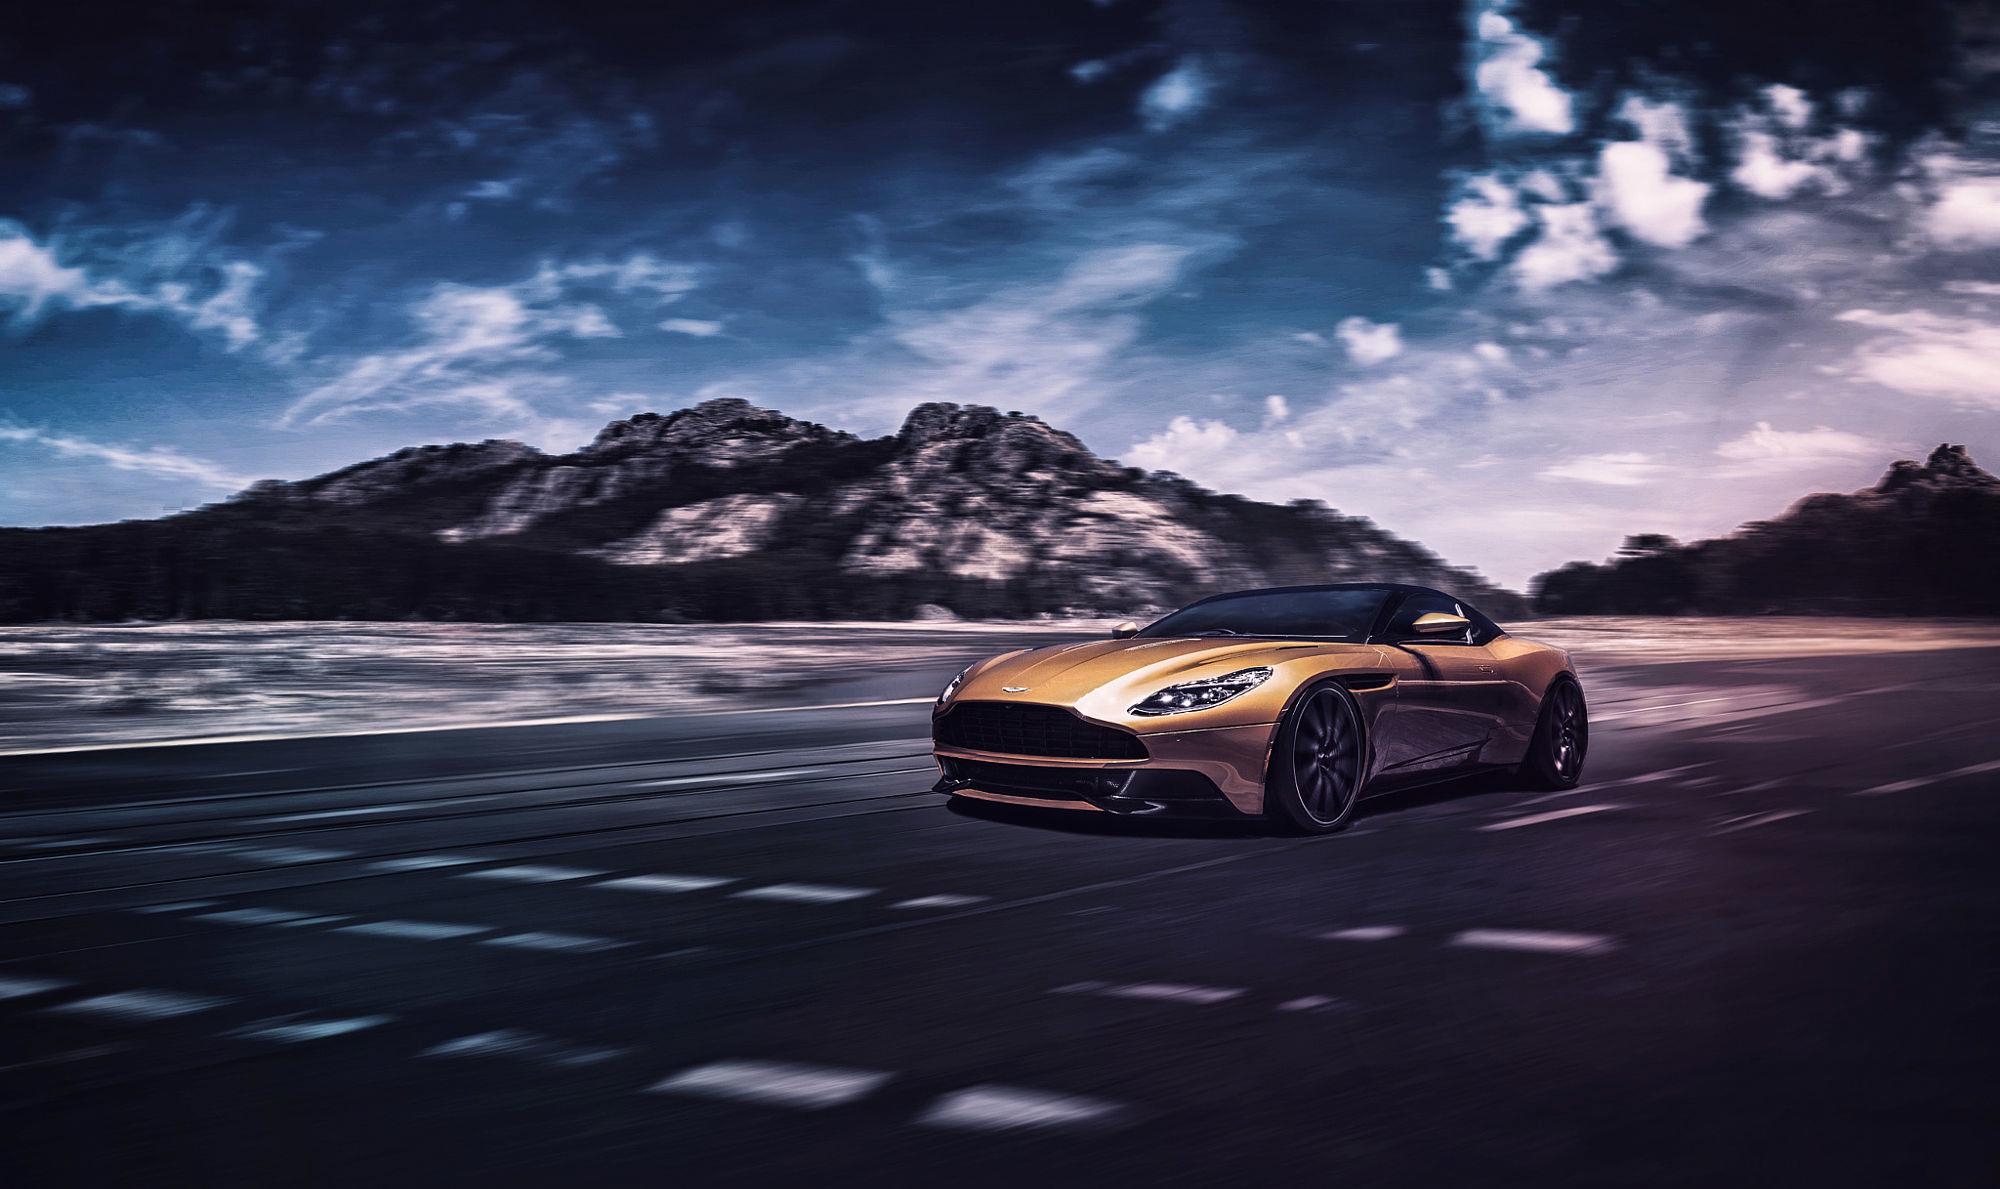 Aston Martin Db11 Hd Wallpaper Background Image 2000x1189 Id